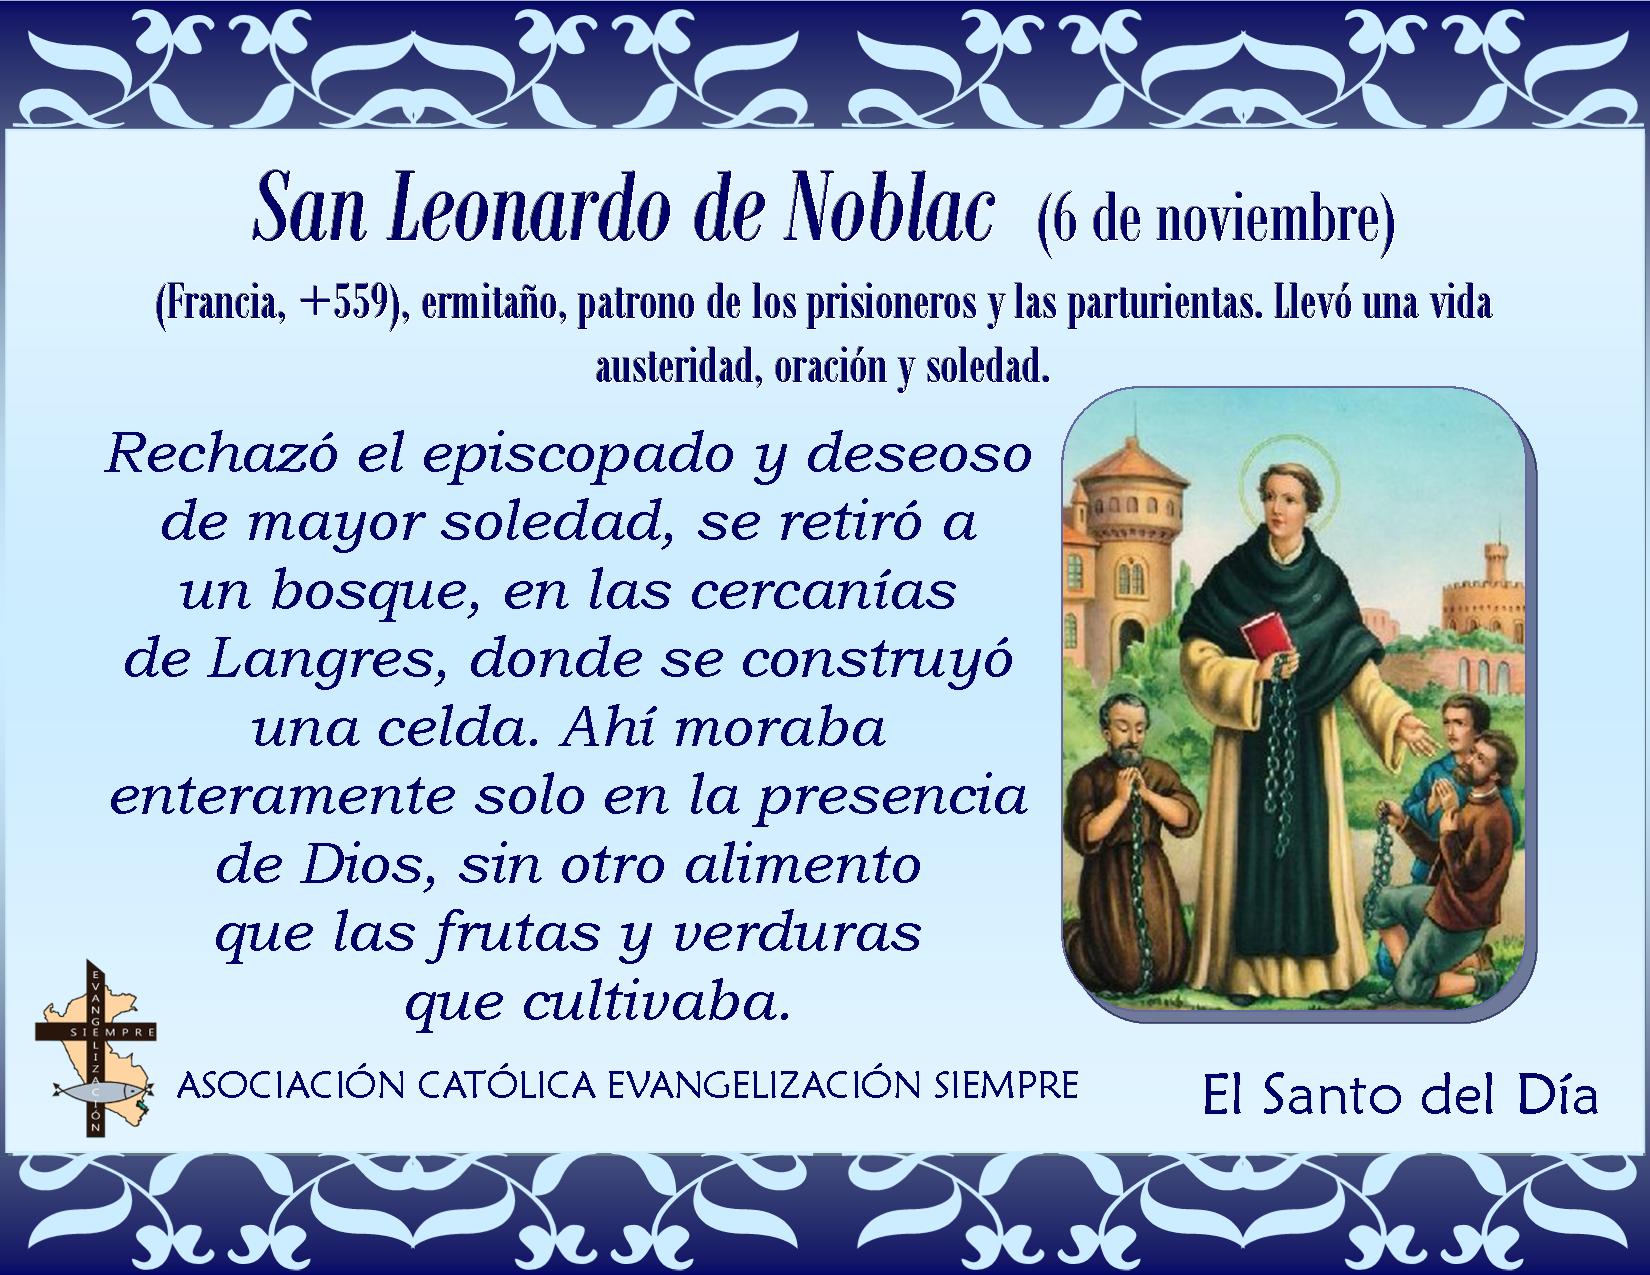 santo-del-dia-6-noviembre